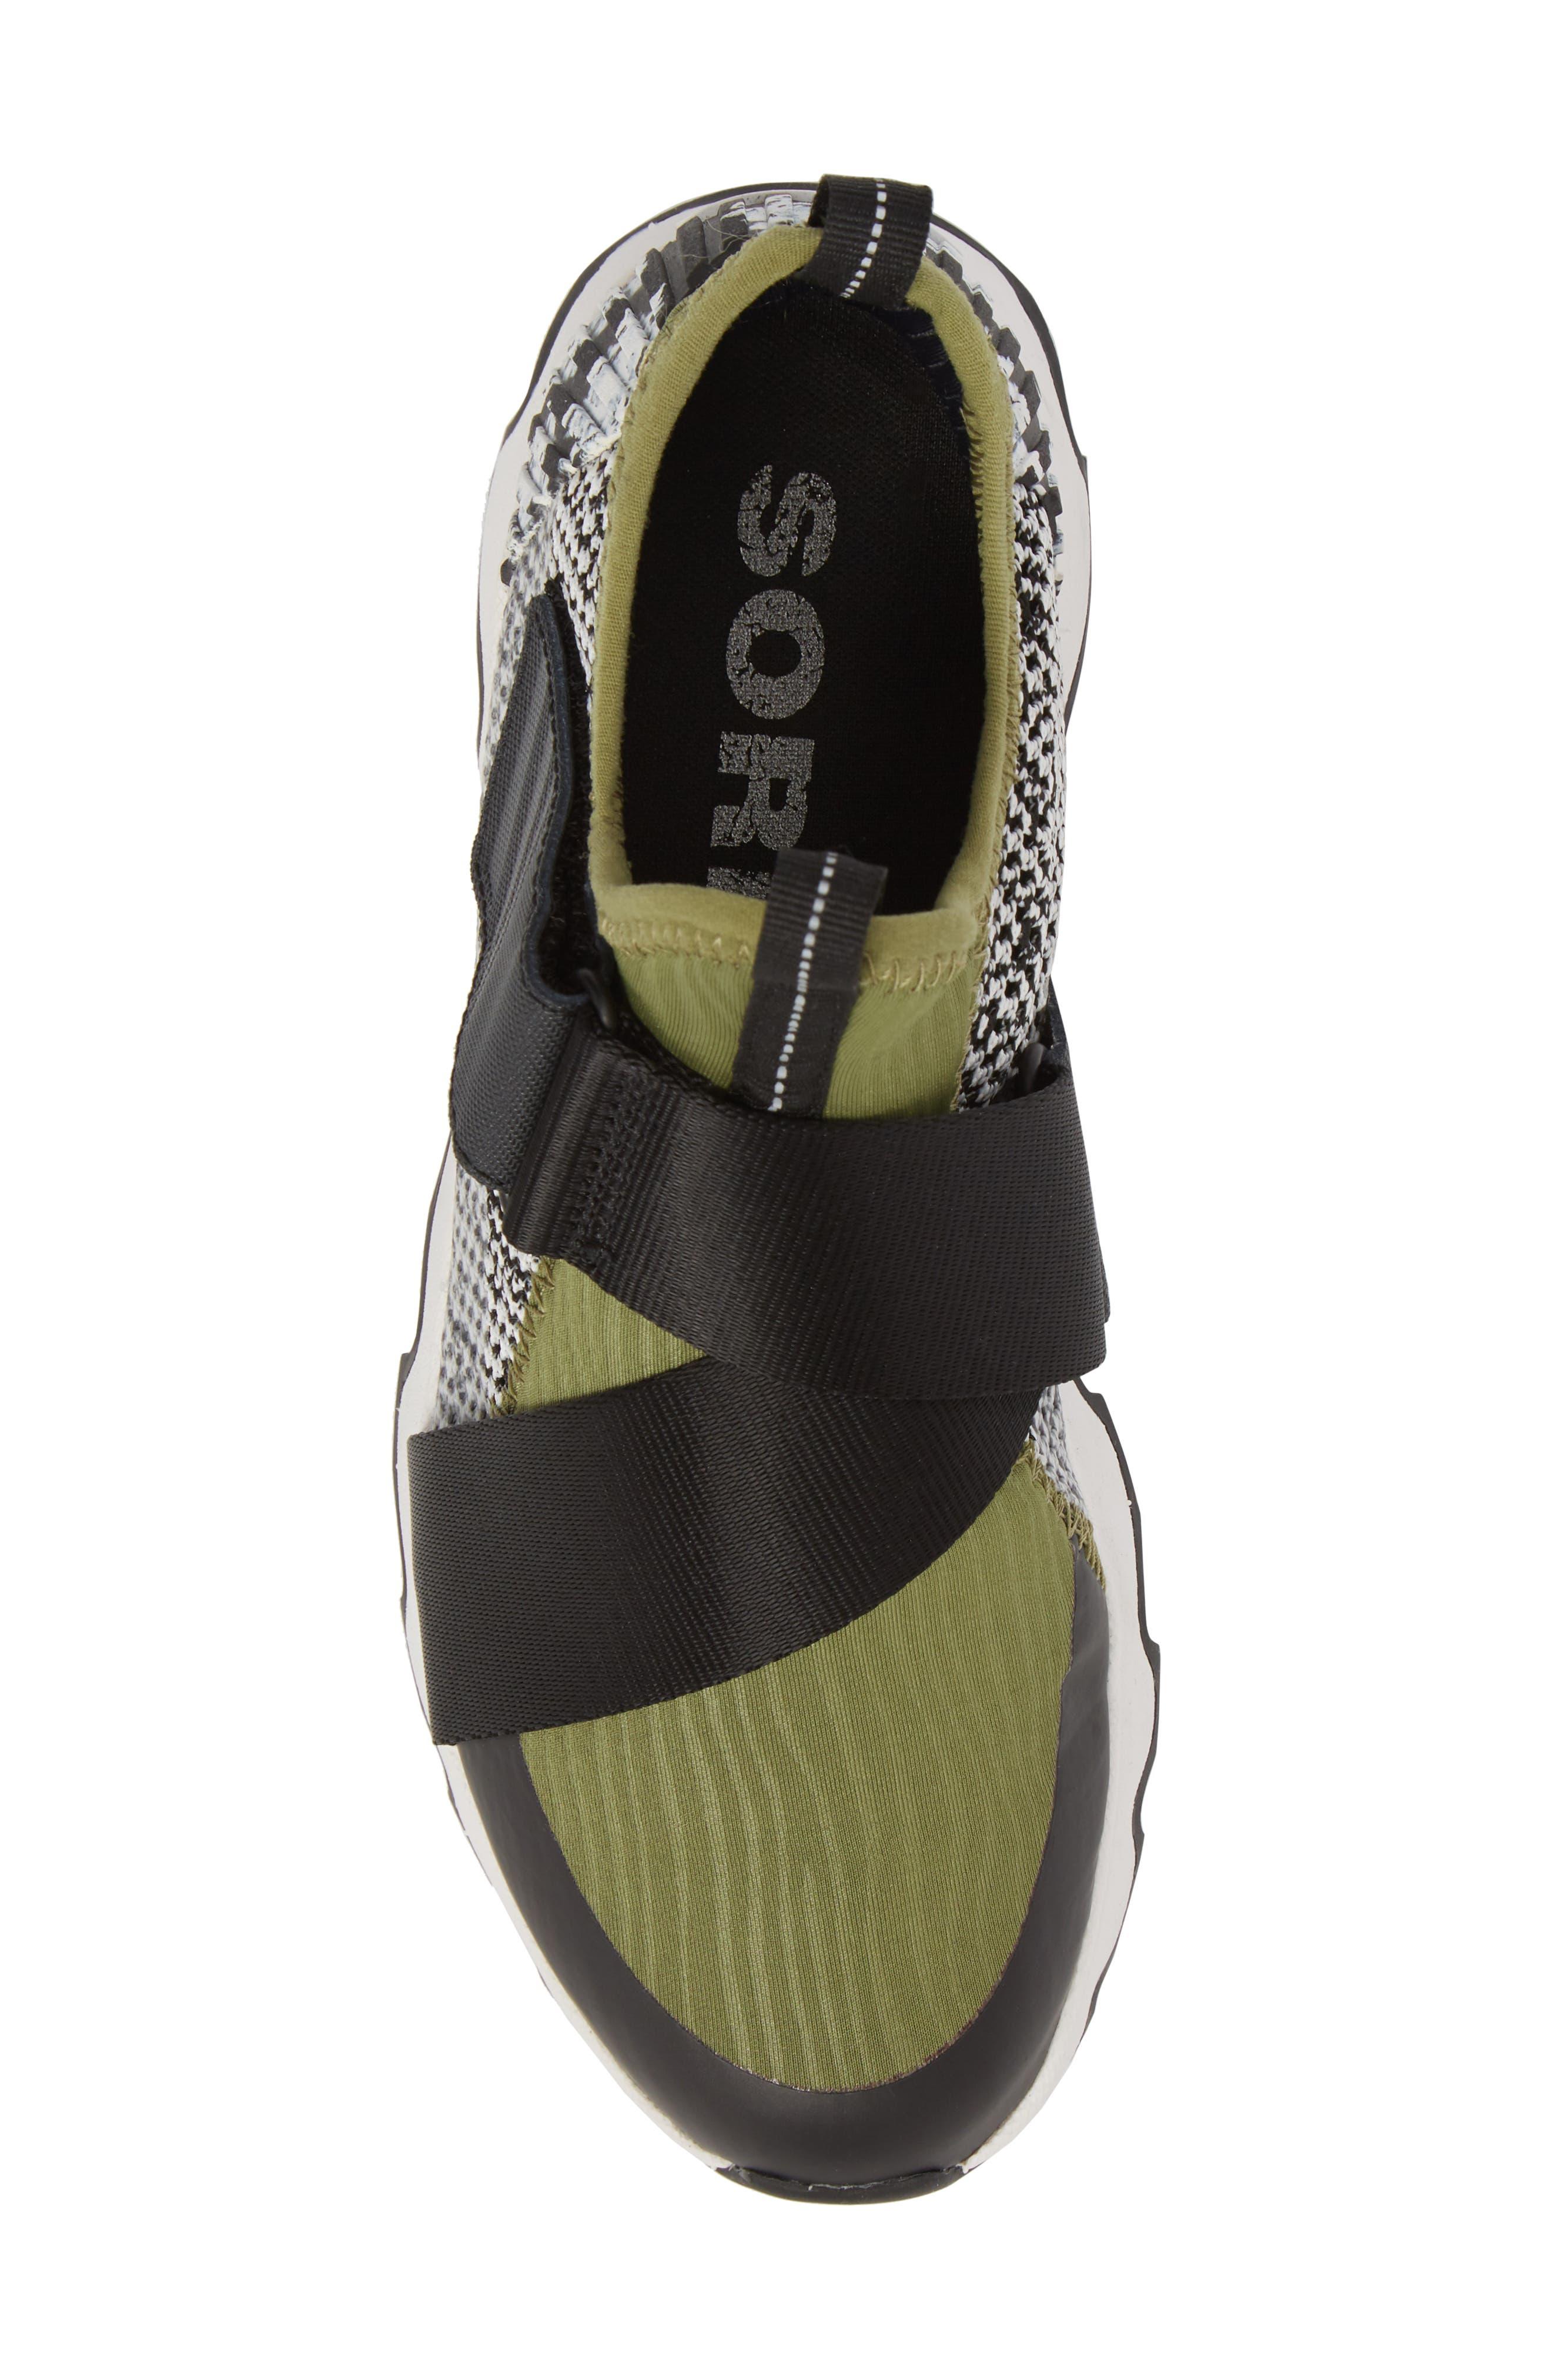 Kinetic Sneak High Top Sneaker,                             Alternate thumbnail 5, color,                             Olive Drab/ White